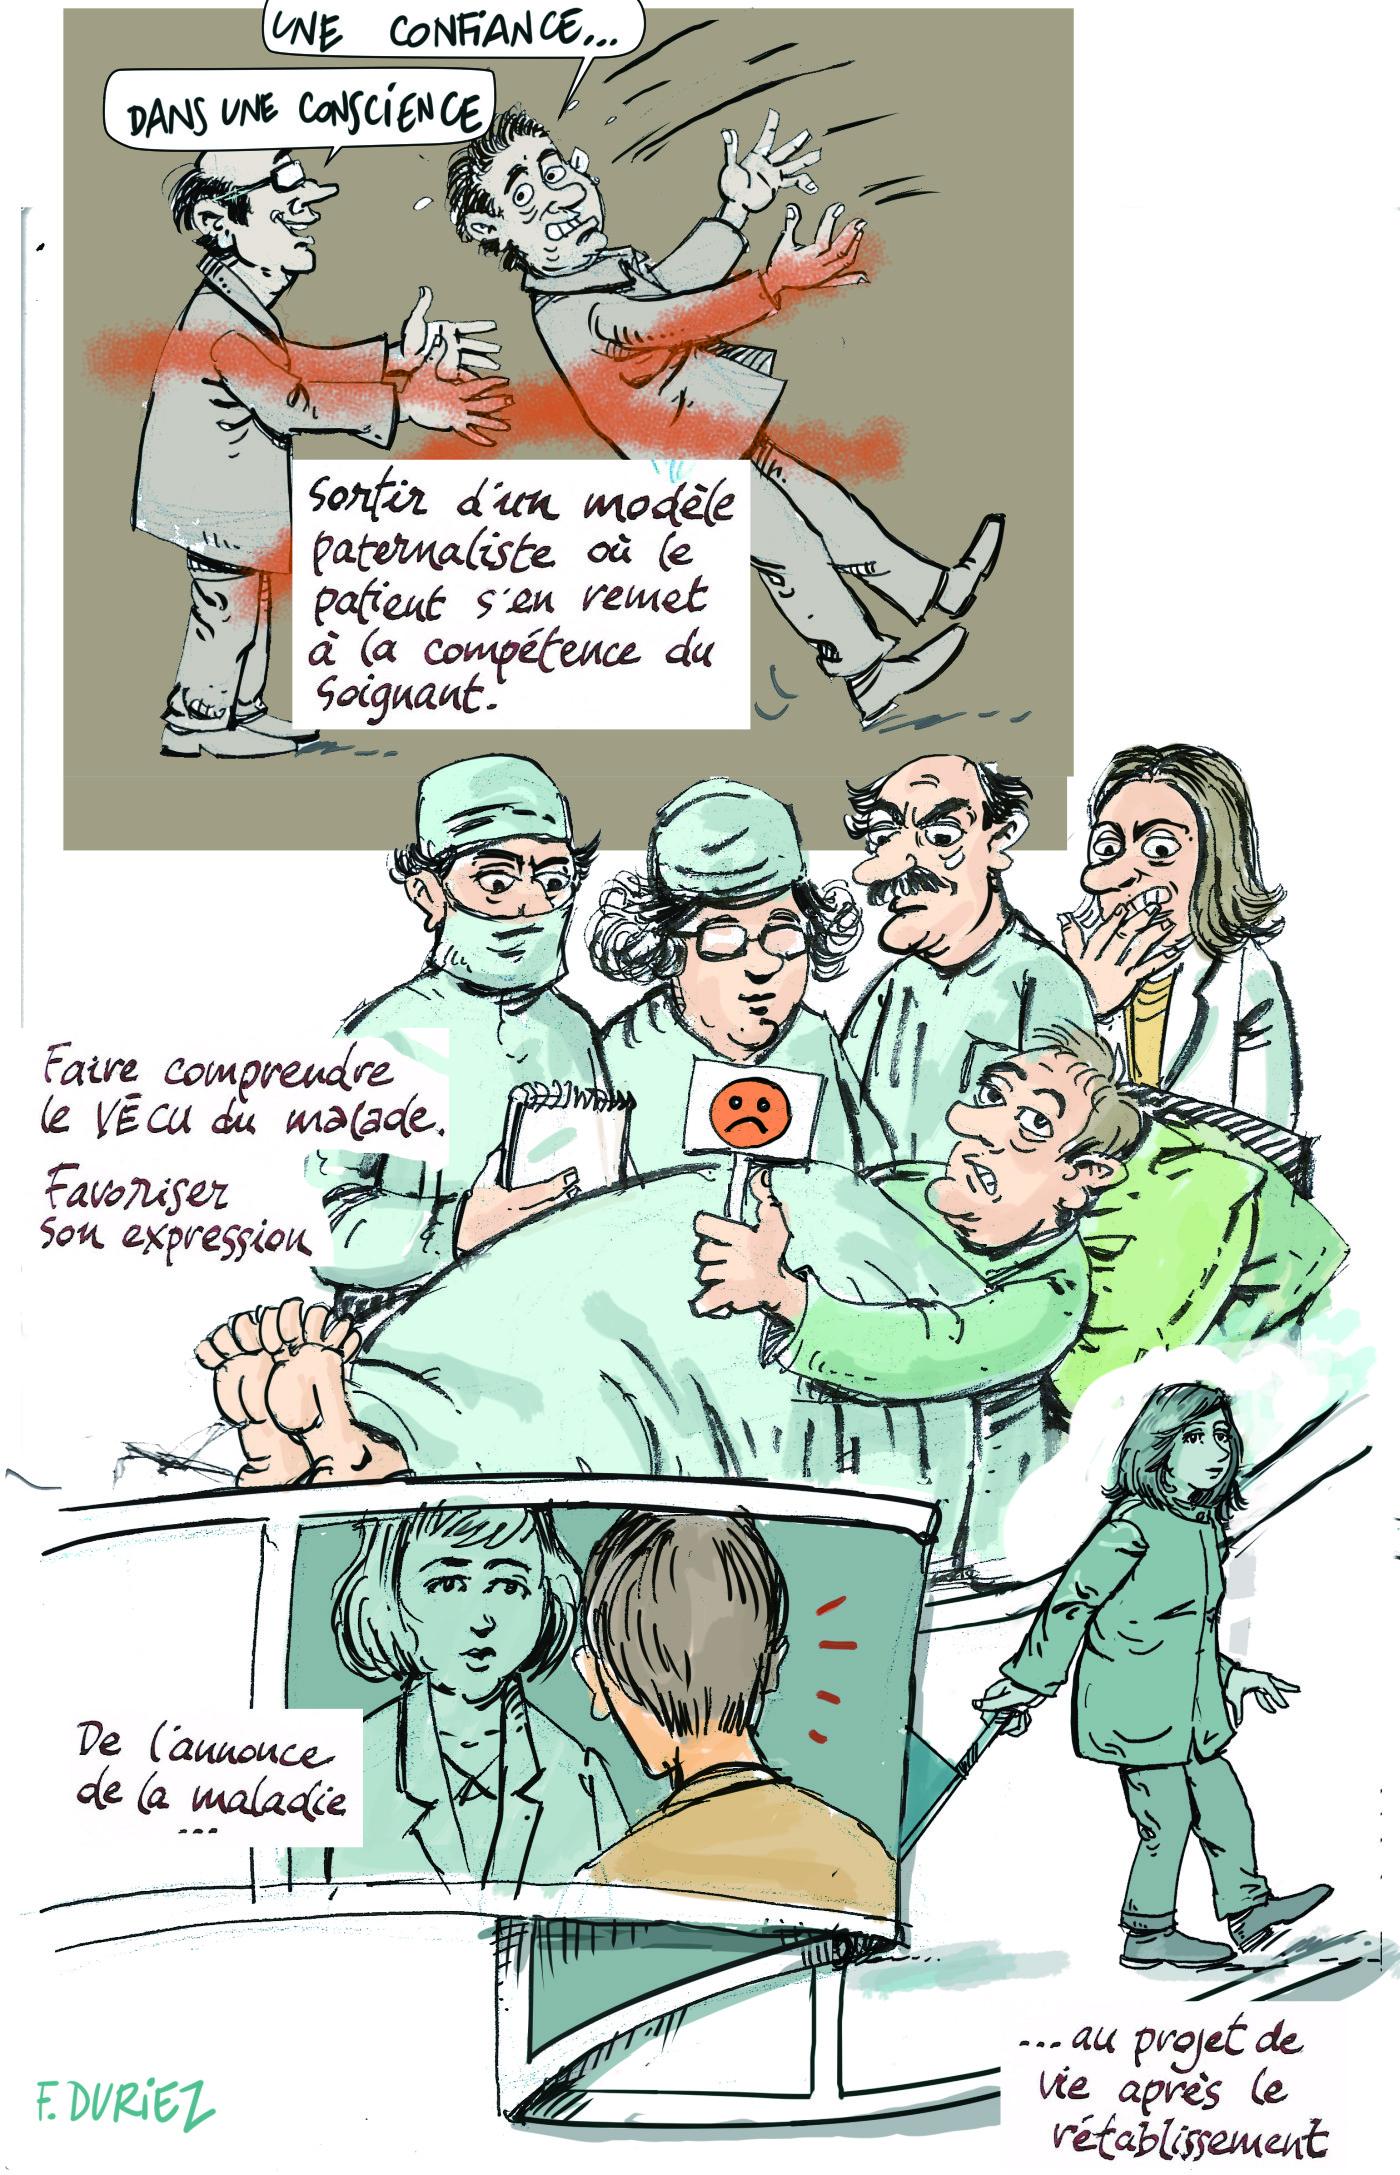 les patients-experts - quels thèmes